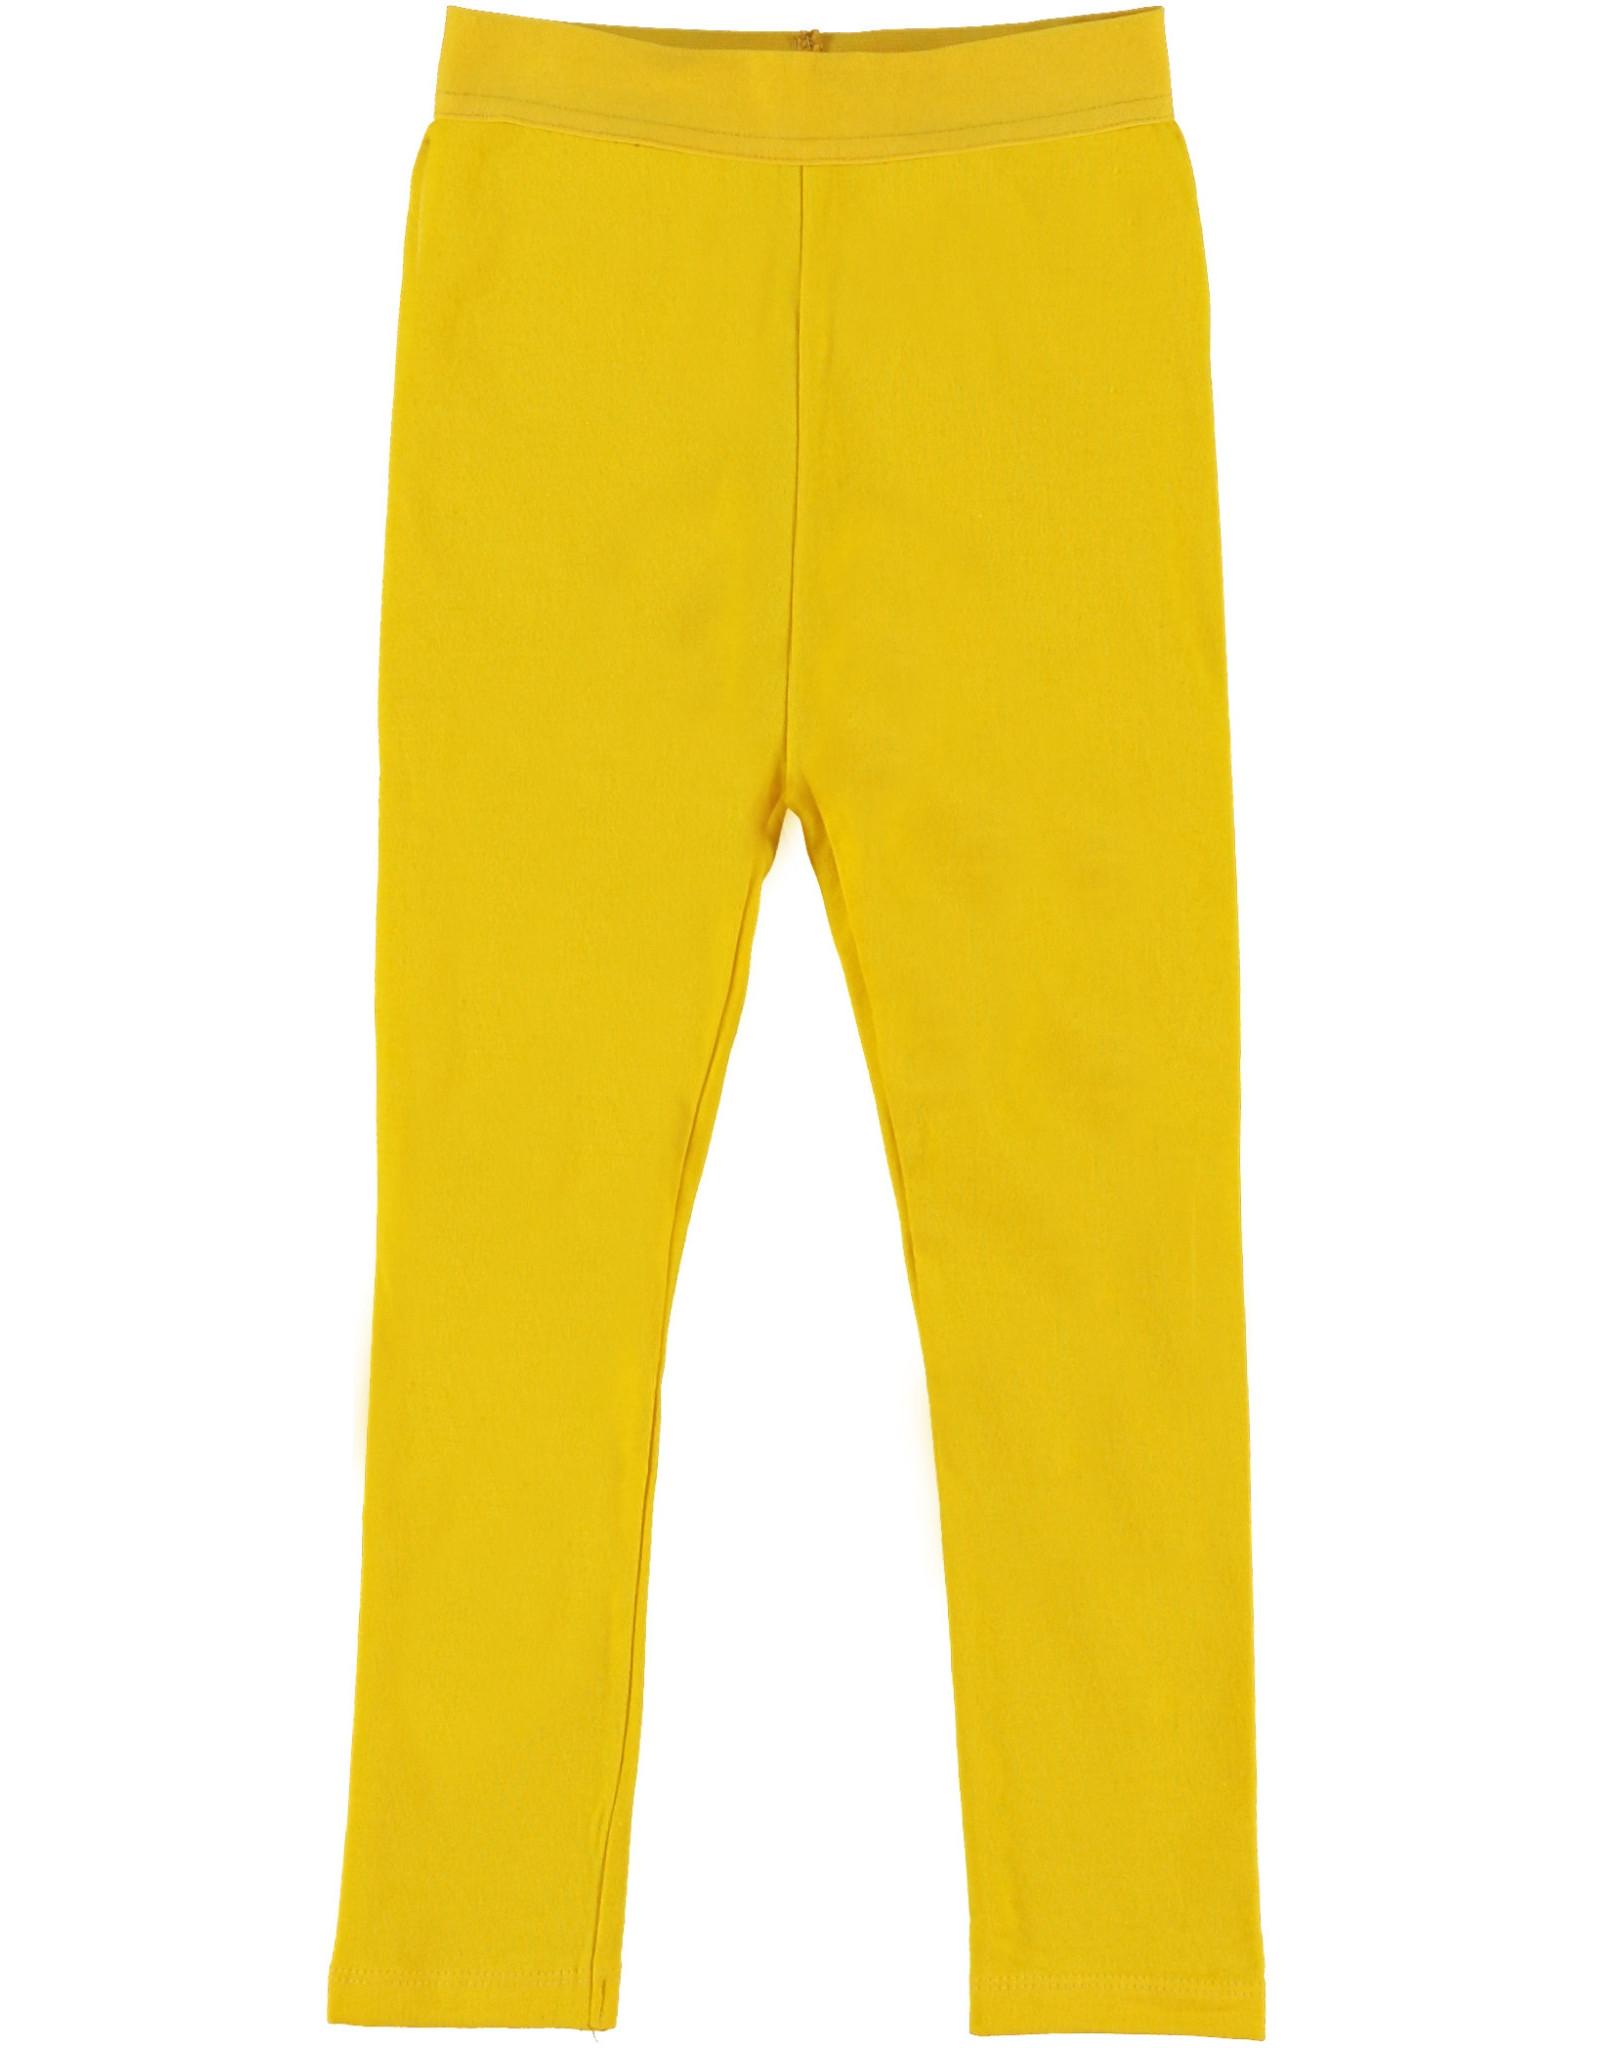 O'Chill O'Chill meiden legging Baeley Yellow